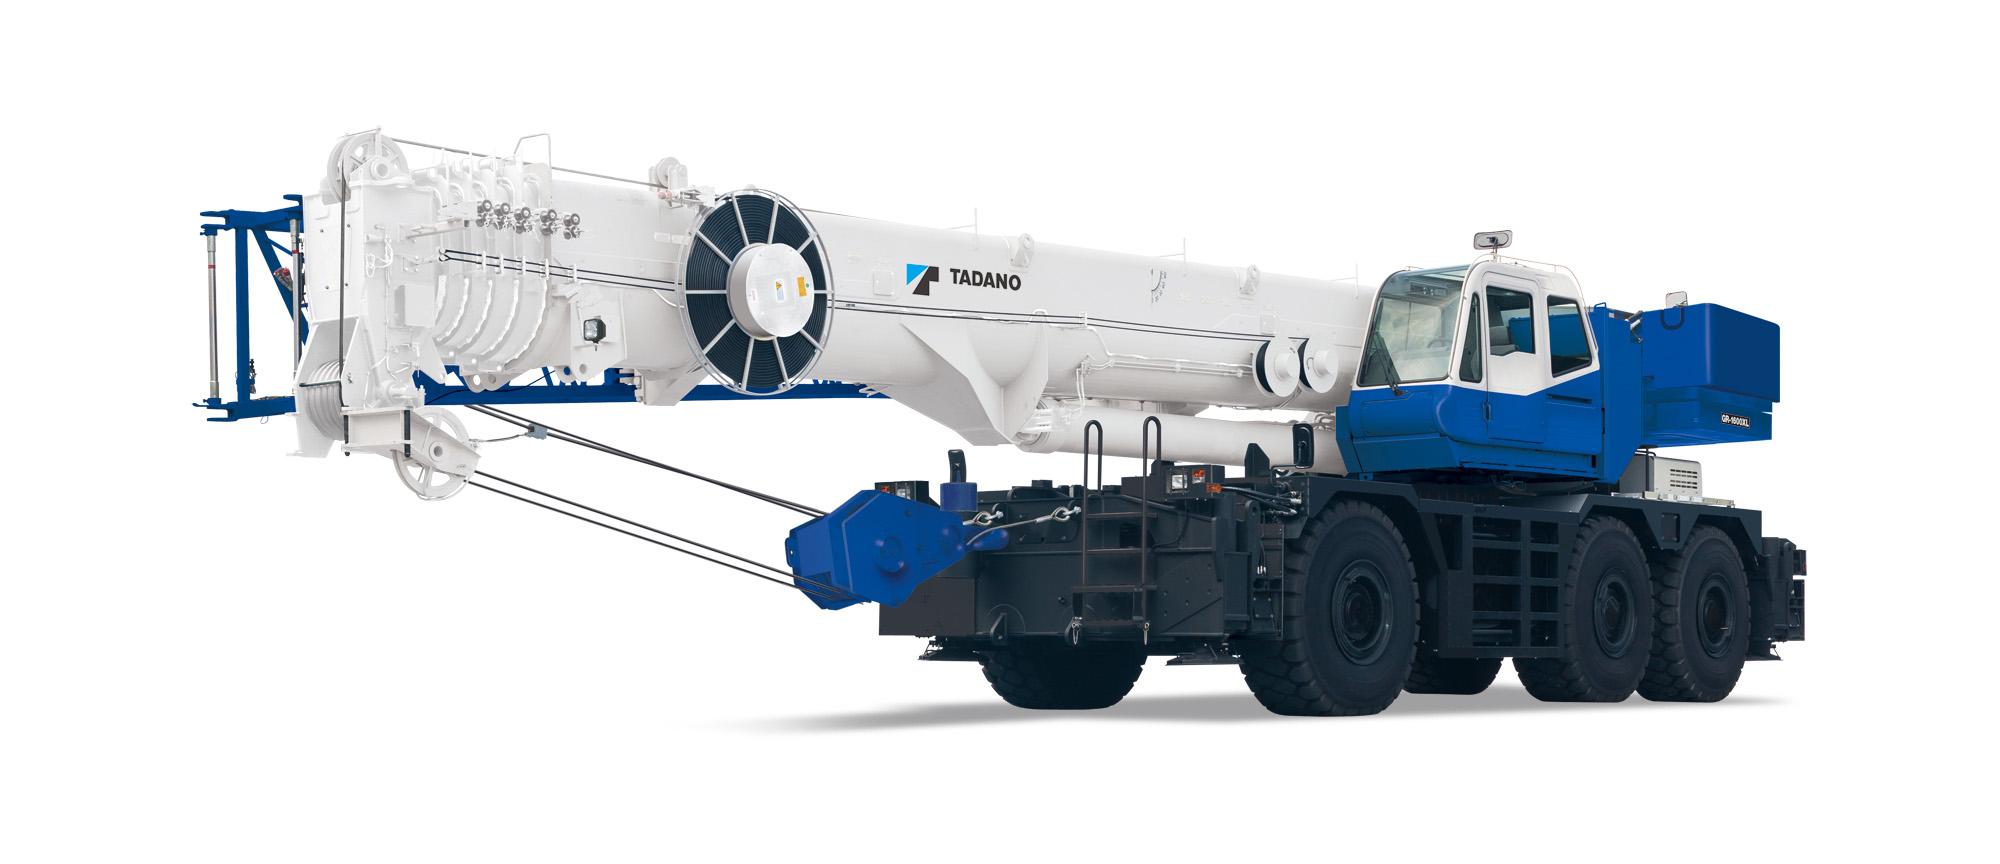 Telescopic Crane 200 Ton : Tadano gr xl rough terrain crane delivers ton